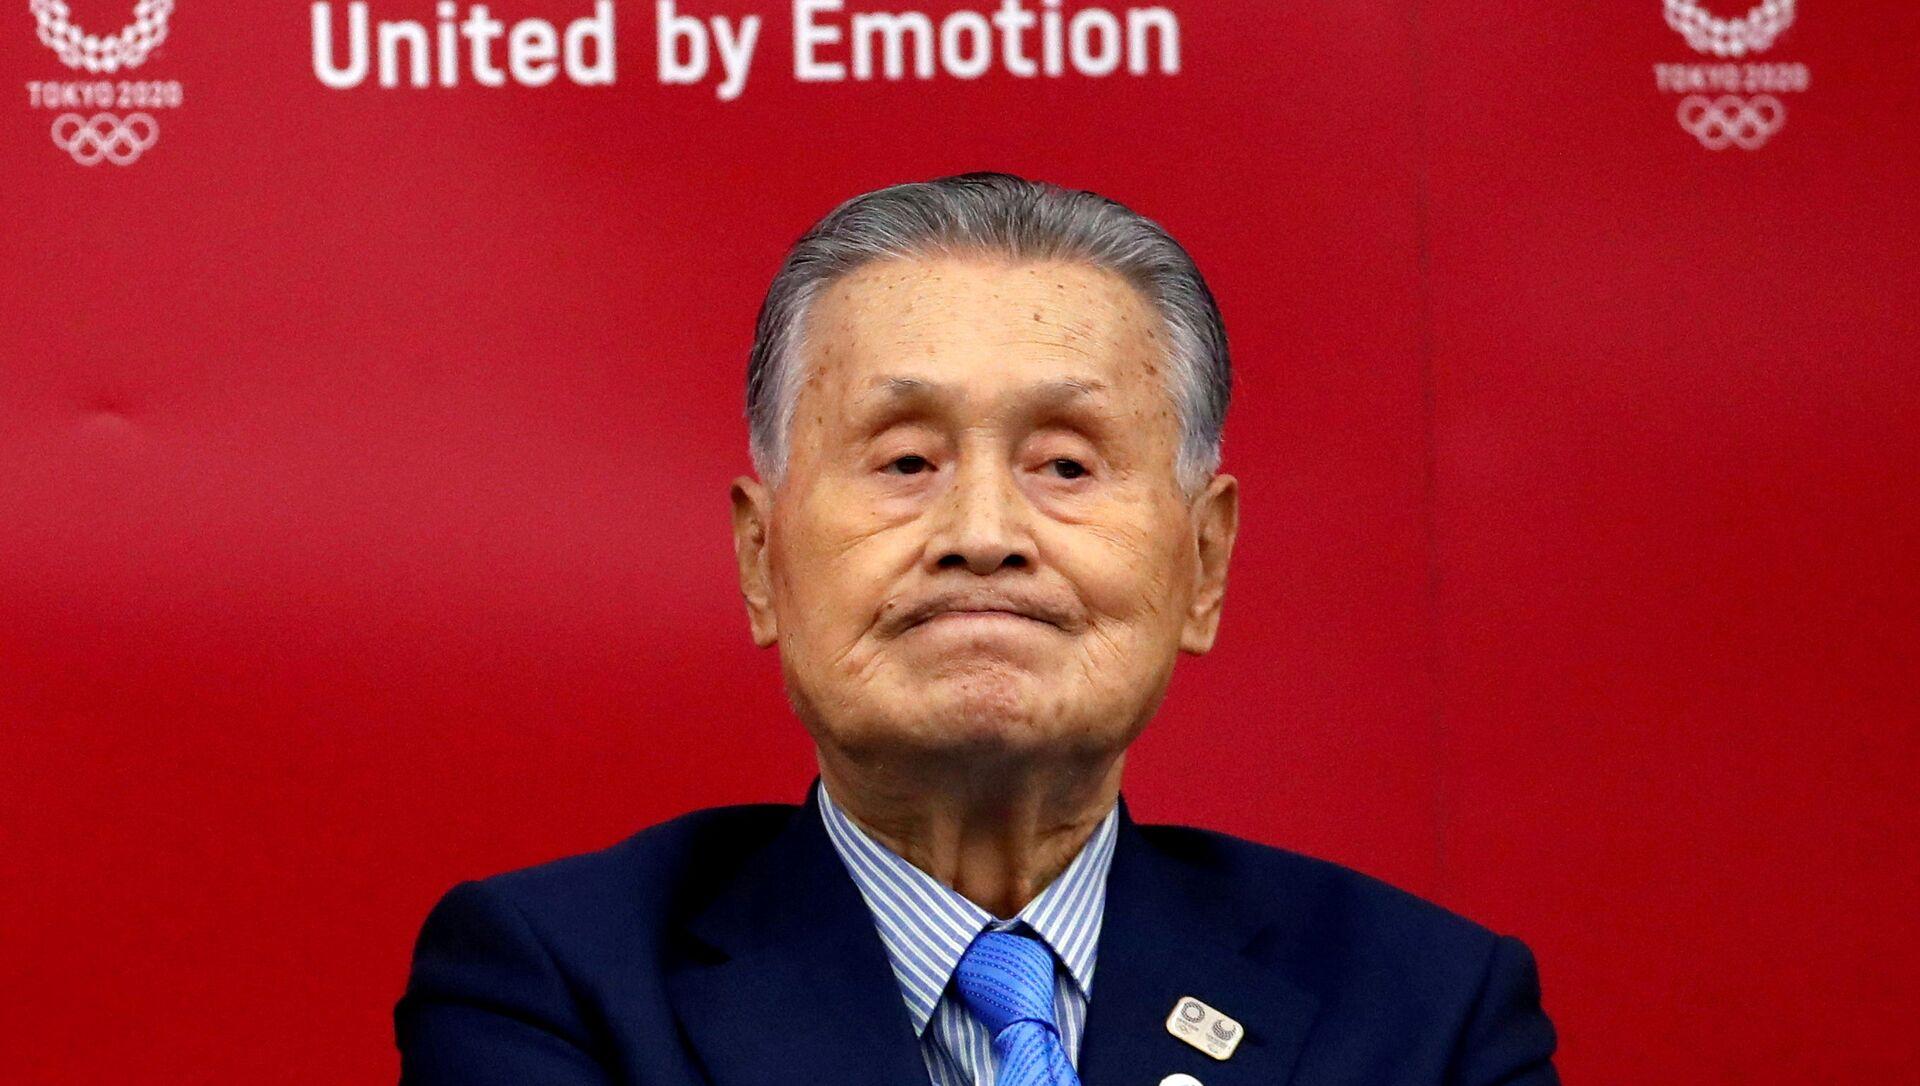 Yoshiro Mori, President del Comitato Olimpico giapponese responsabile per Tokyo 2020  - Sputnik Italia, 1920, 12.02.2021